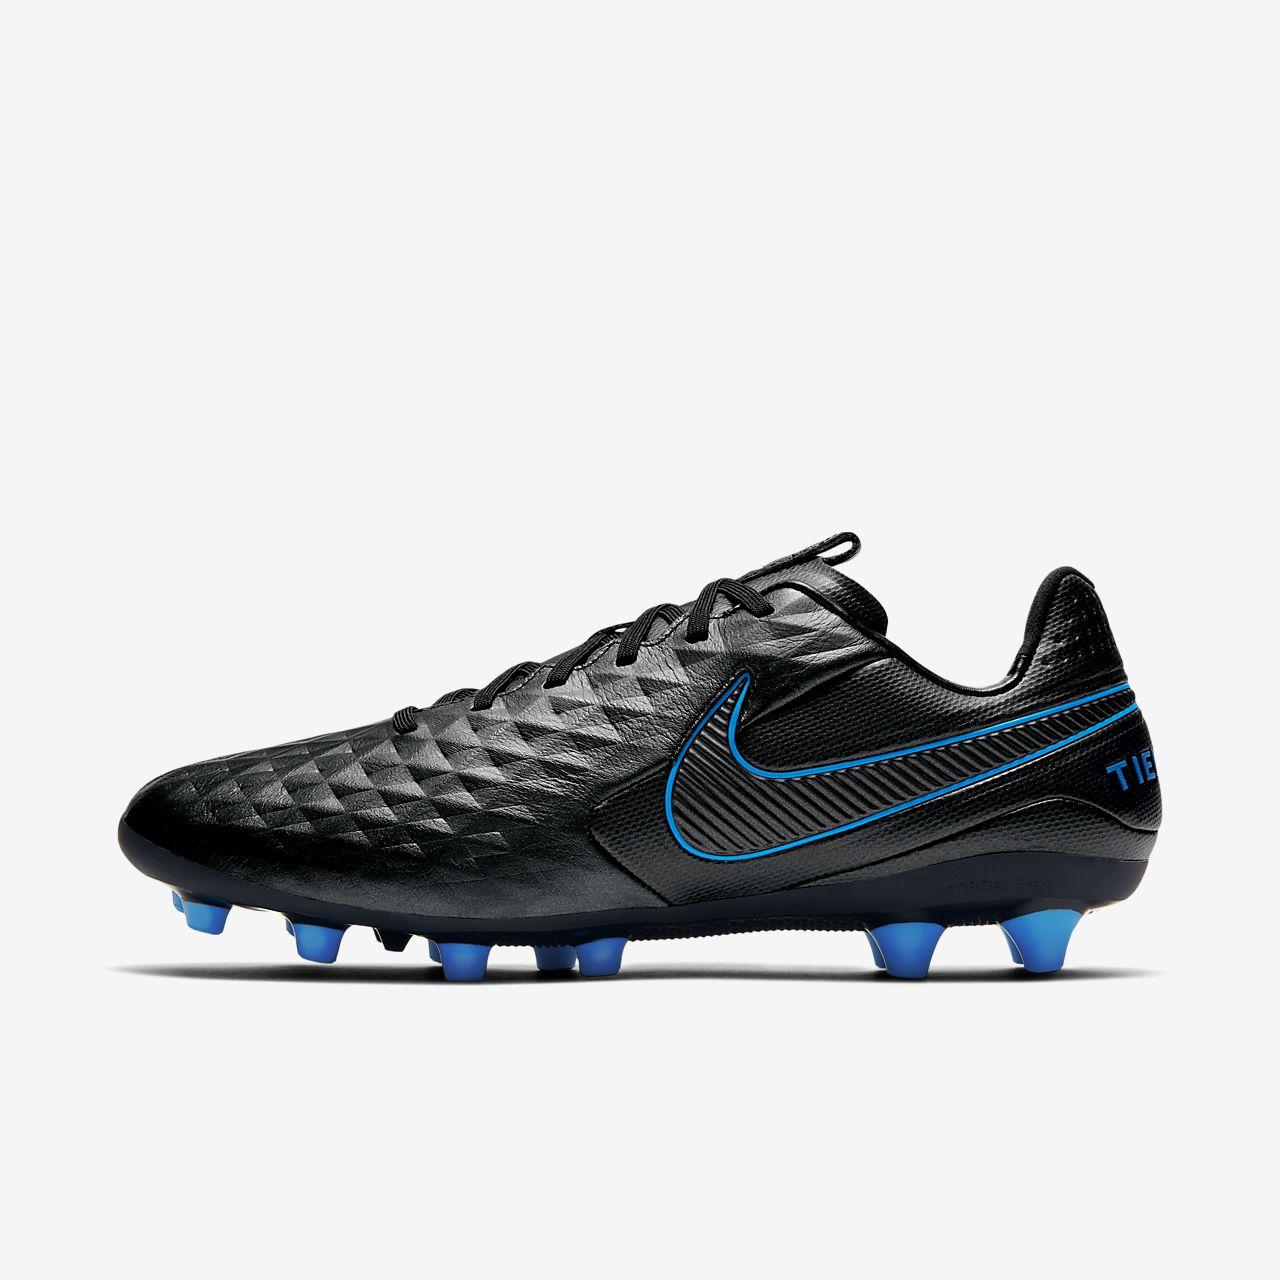 Nike Tiempo Legend 8 Pro AG-PRO Botes de futbol per a gespa artificial